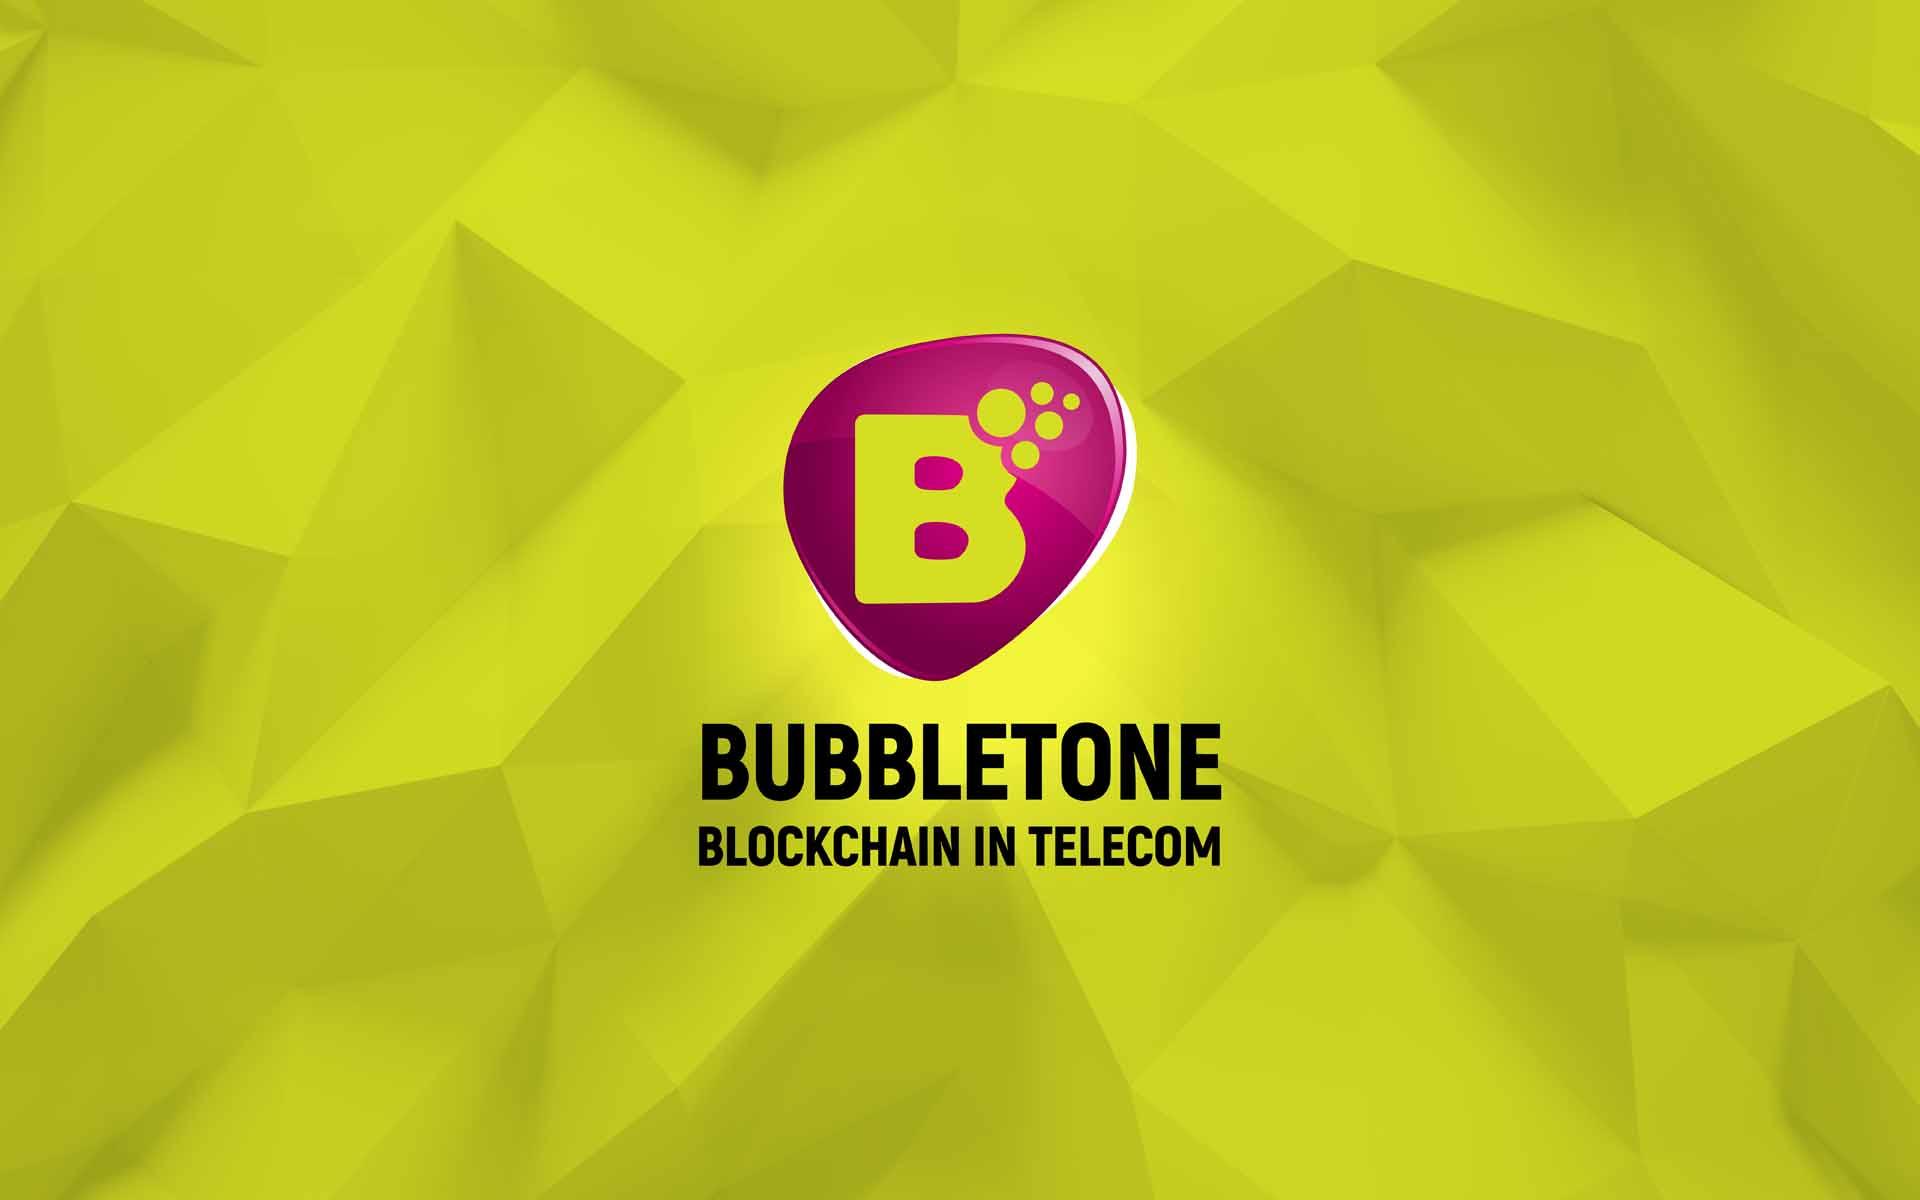 BubbleTone Creates Ultrafast Blockchain to Decentralize Mobile Roaming